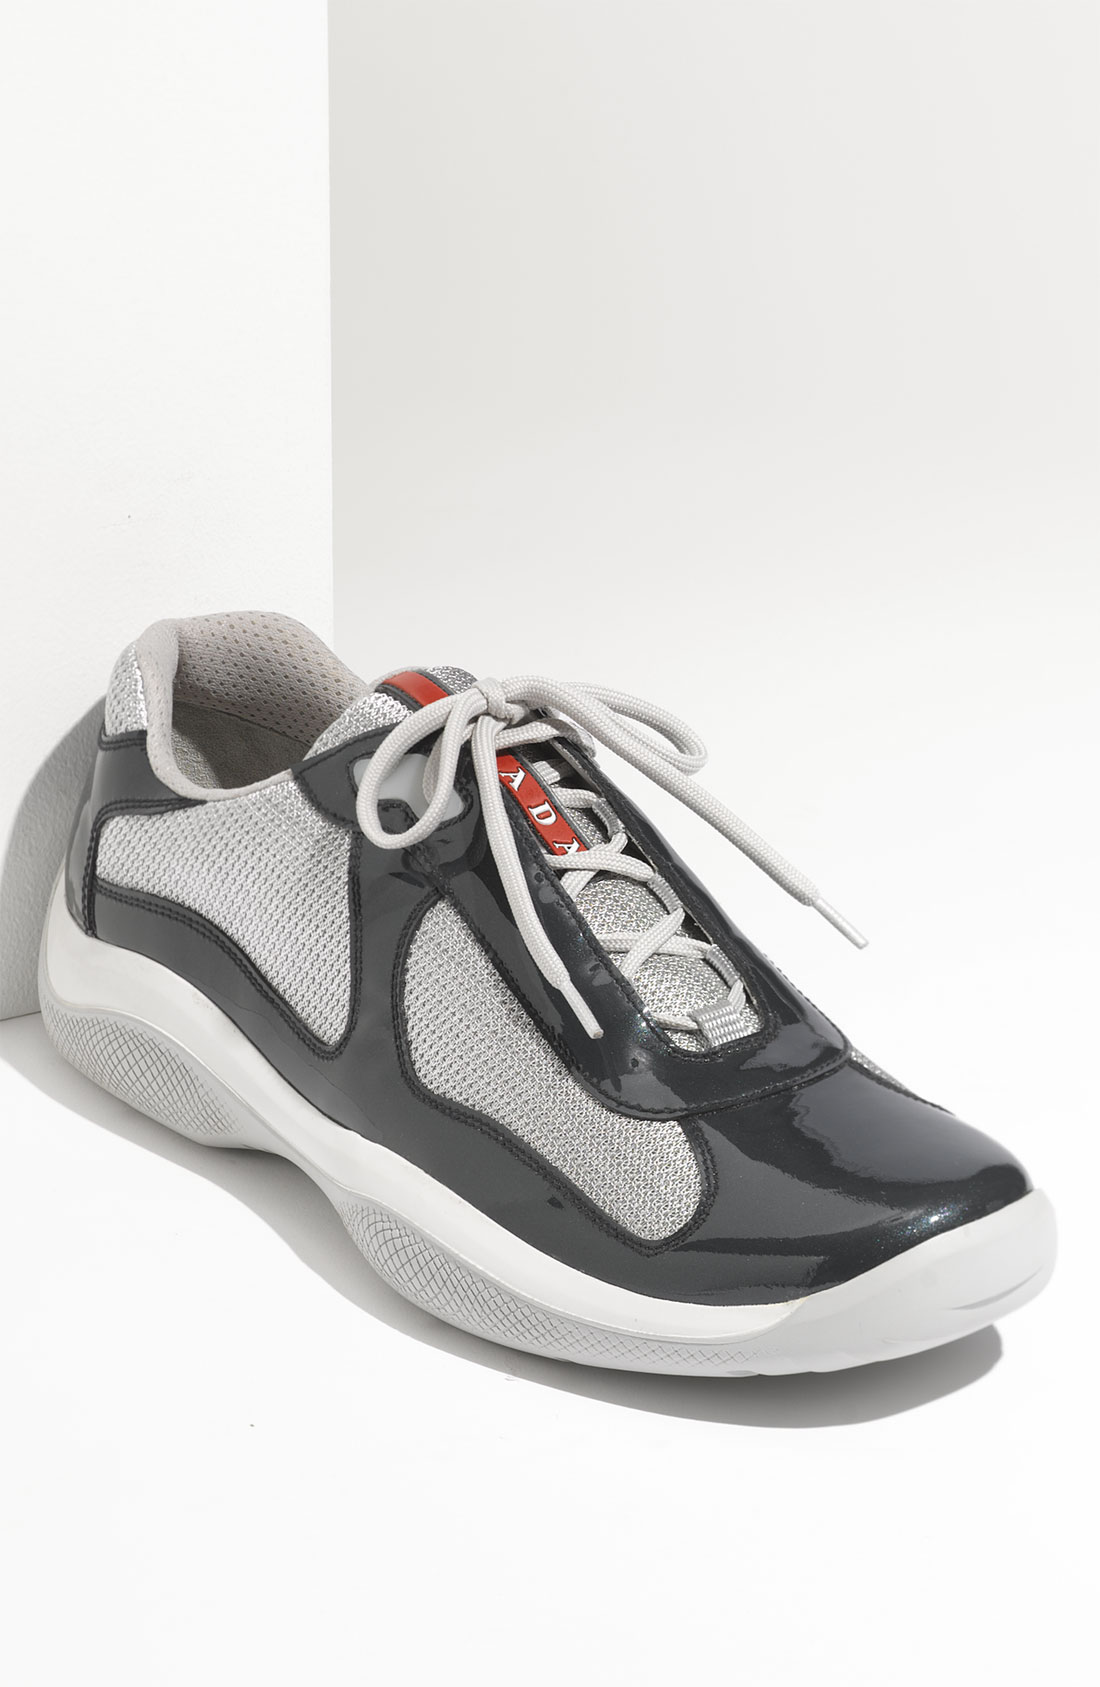 Skechers Tennis Shoes Near Me